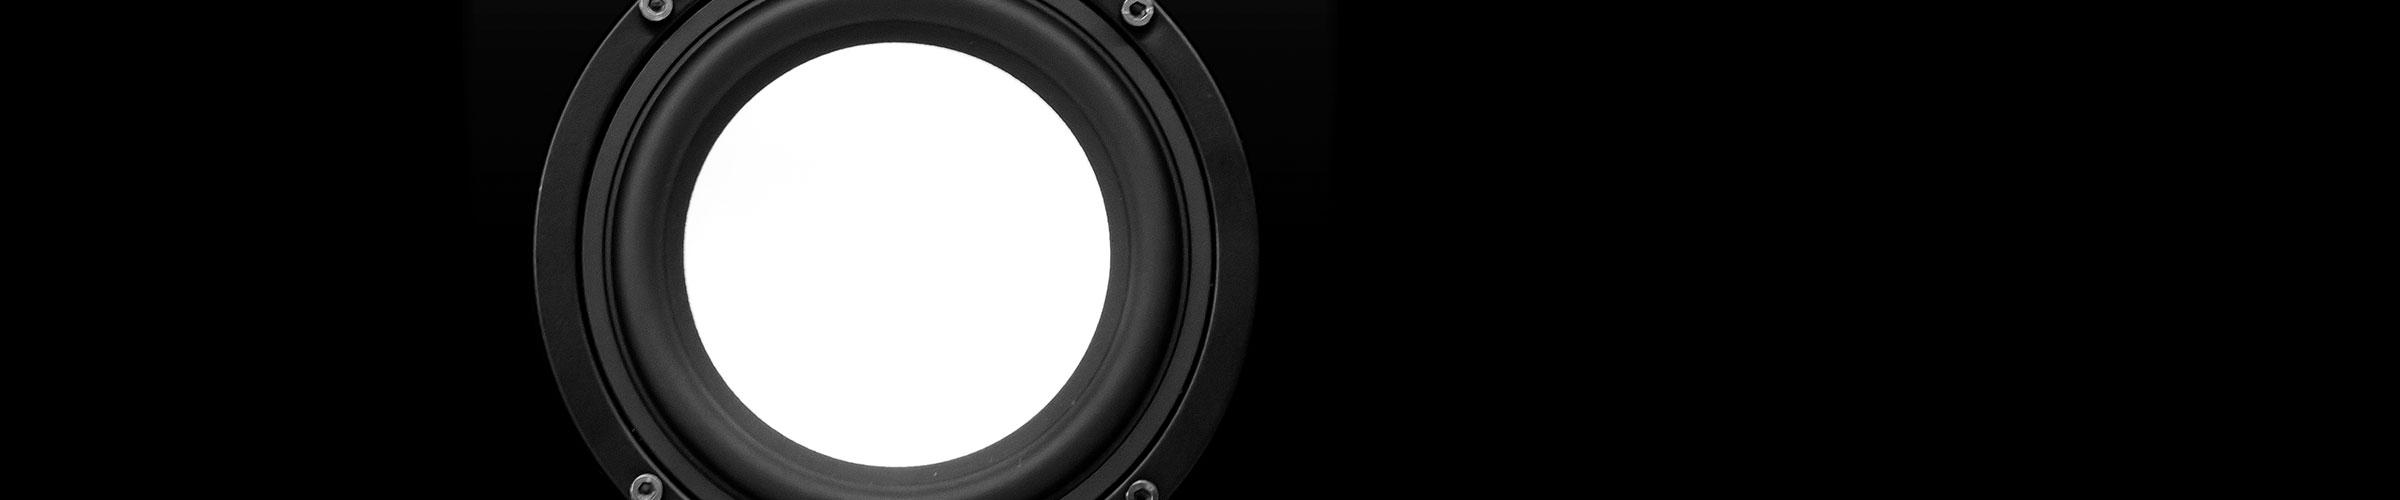 XL5 Midrange that Accentuates the Vocals